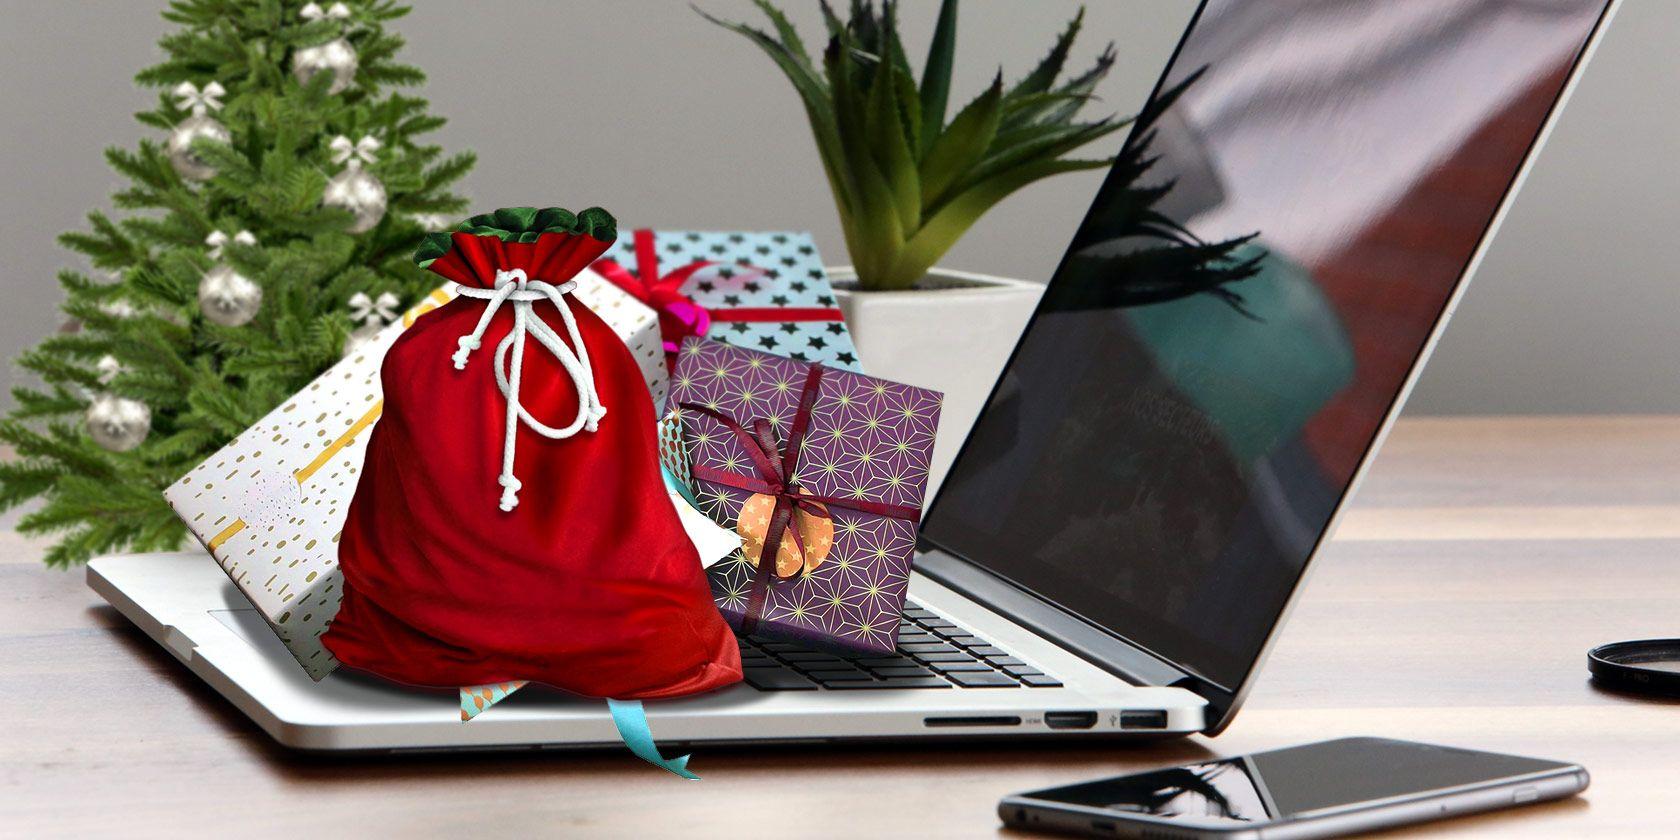 mac-cool-gifts